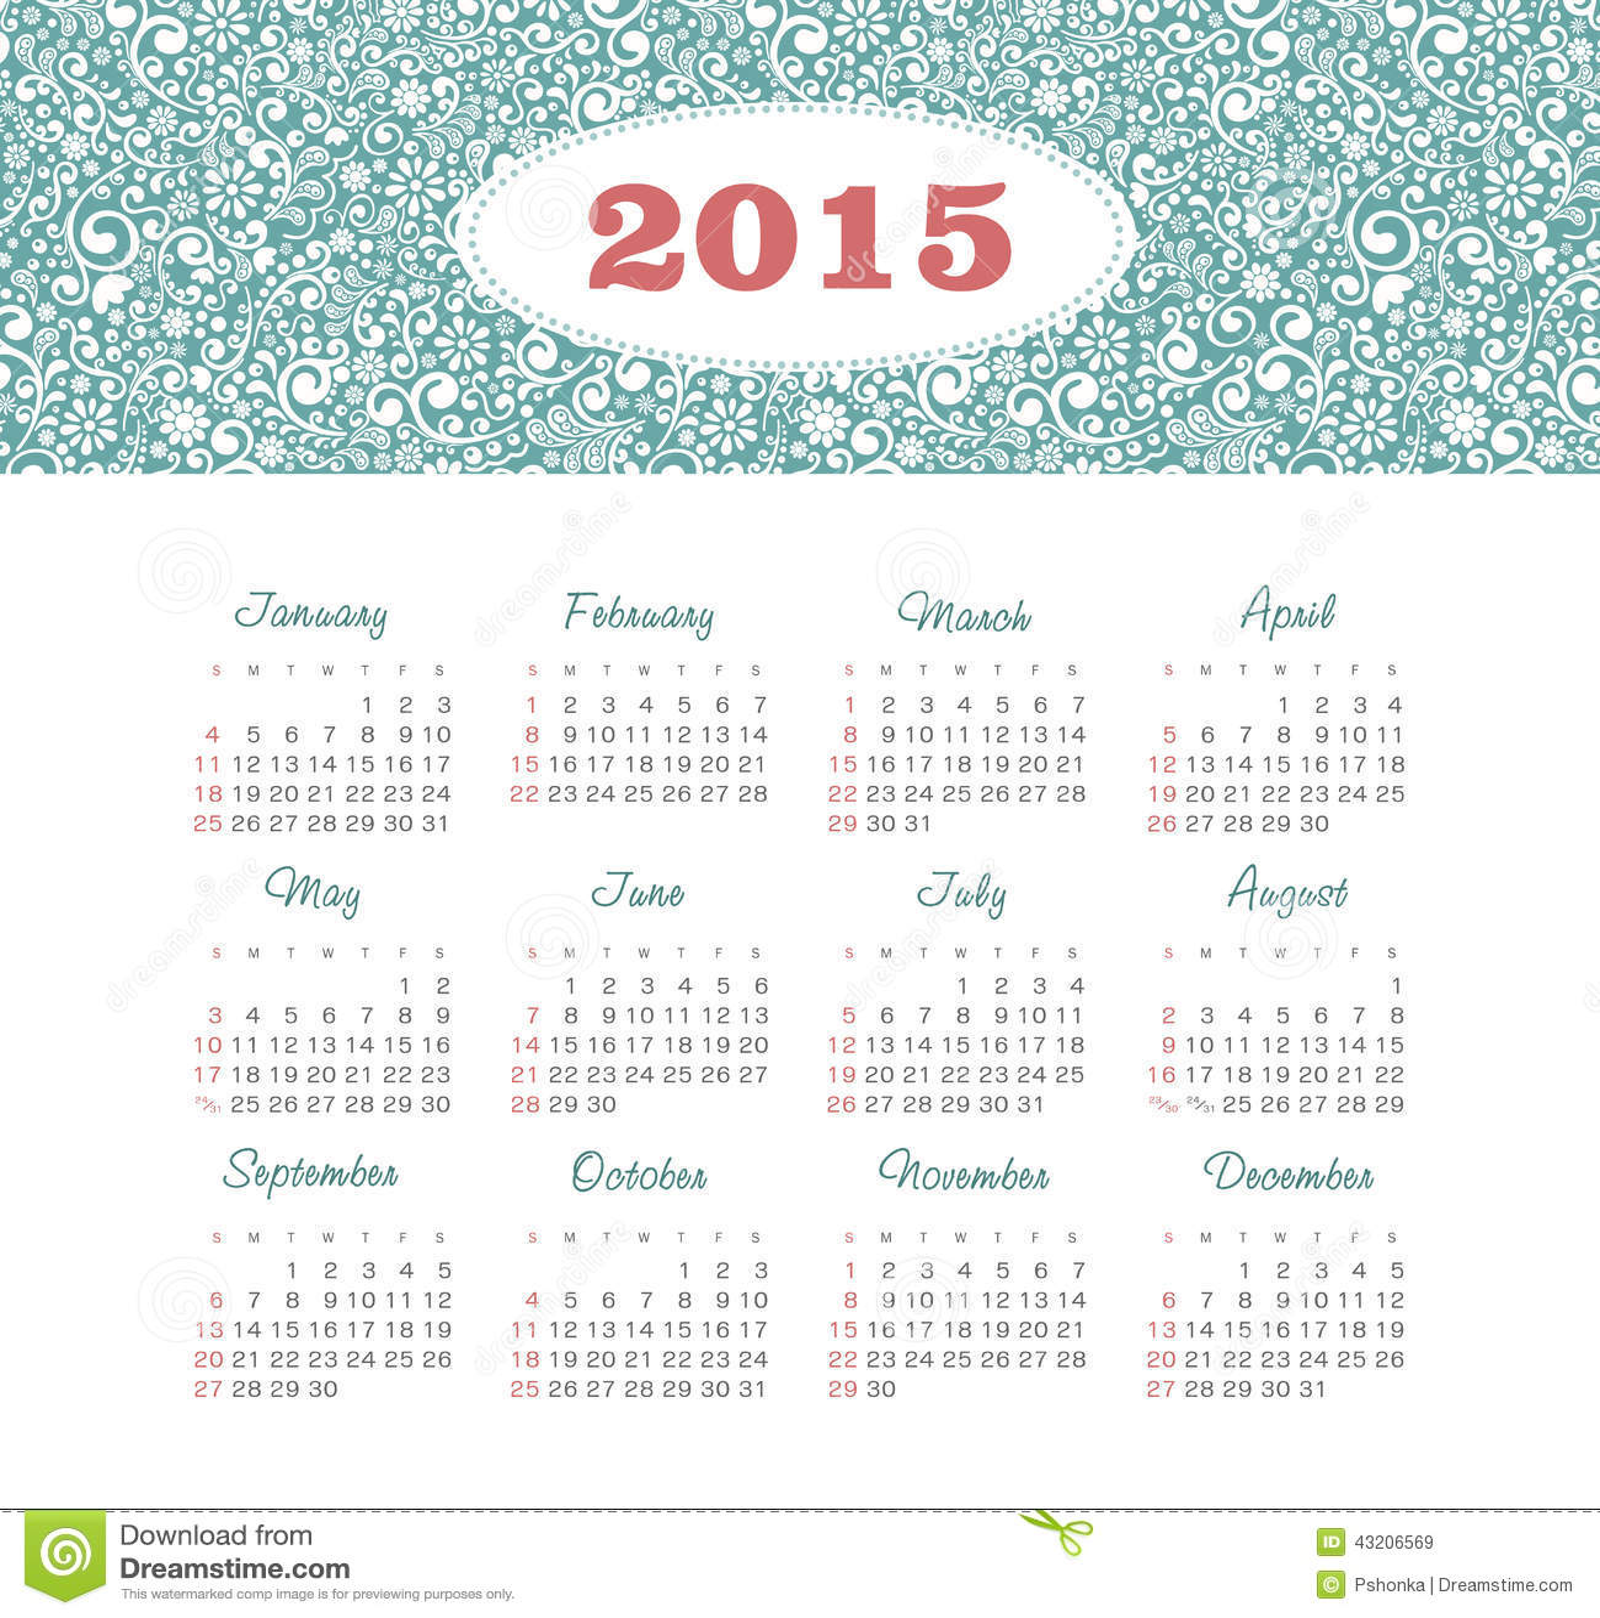 2016 4x6 Yearly Calendar Printable Free   Calendar Template 2016